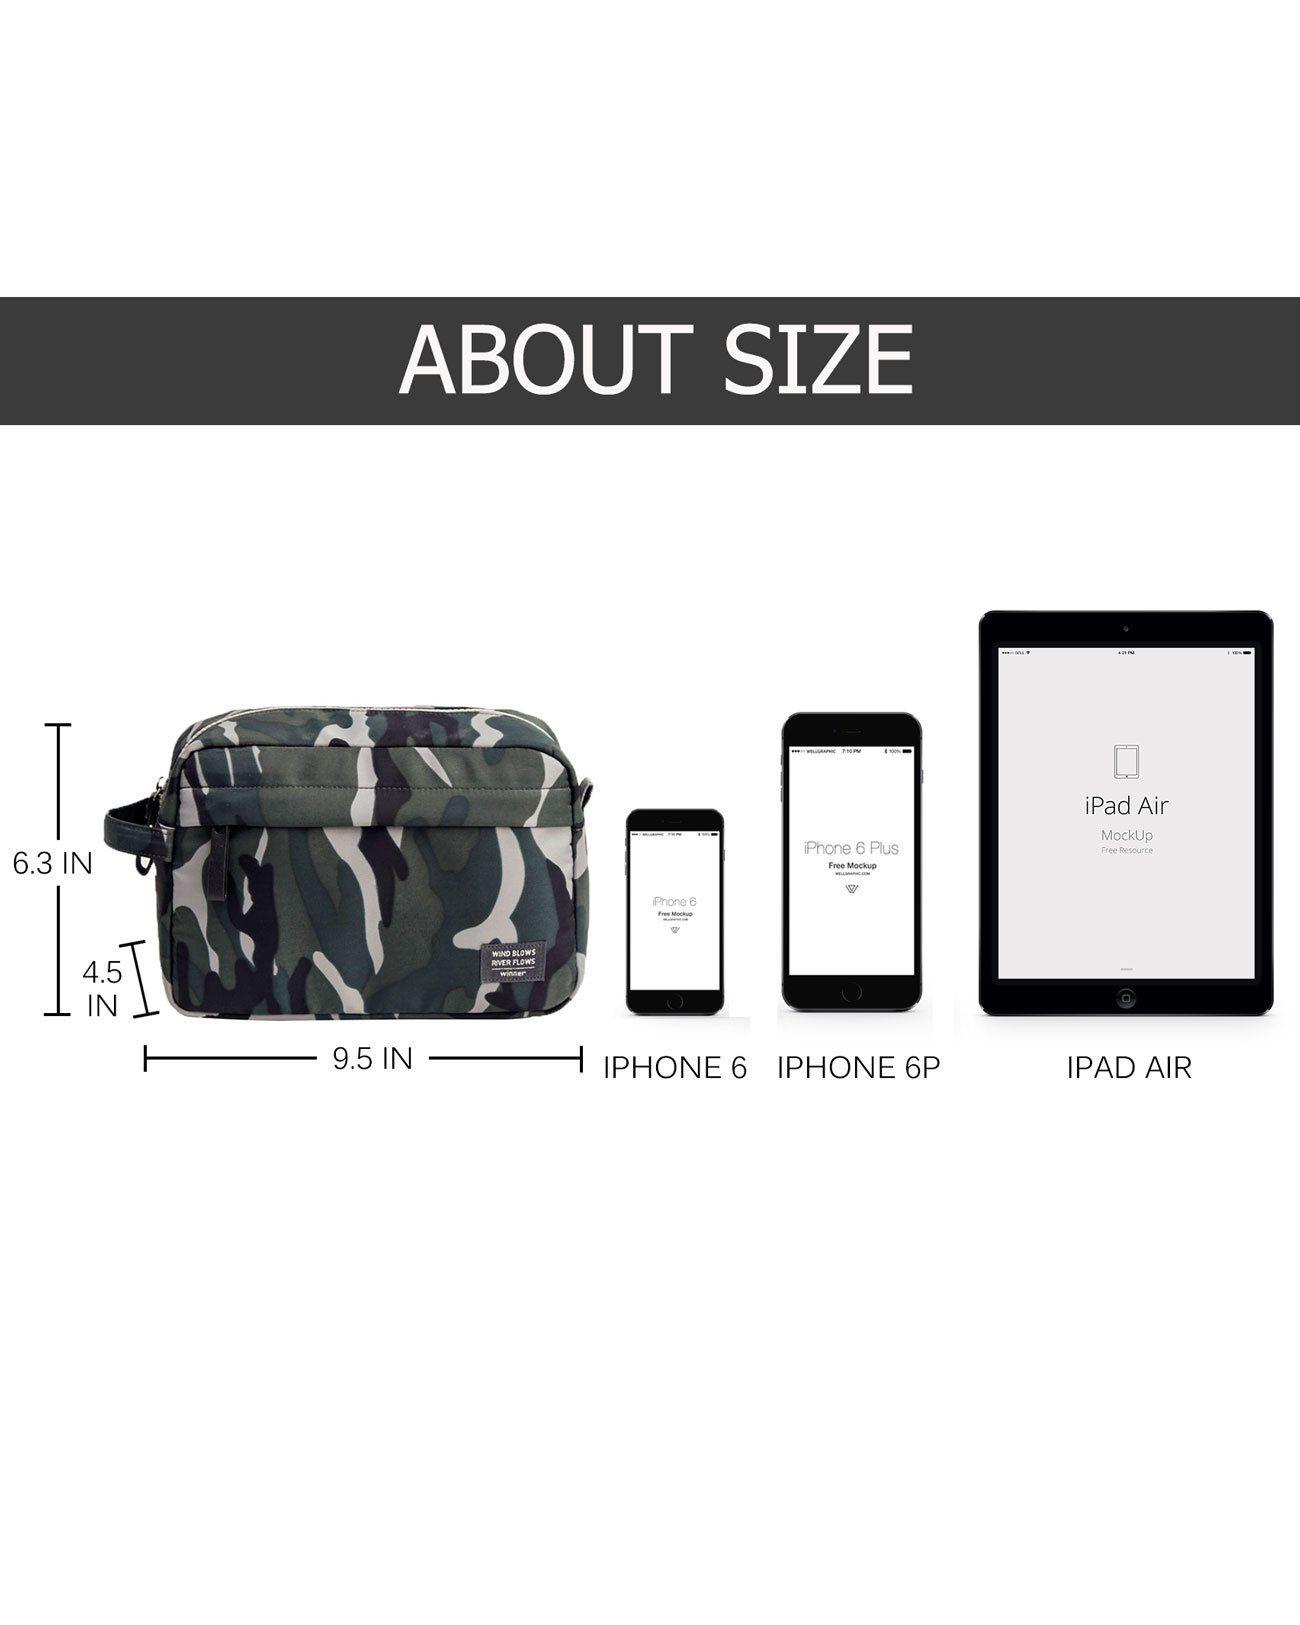 8a3a556713 Canvas Mens Travel Toiletry Bag Waterproof Dopp Kit Bag Cosmetic Makeup  Organizer Bathroom Shower Toiletries Accessories Shaving Bag for Men Women    Gift ...